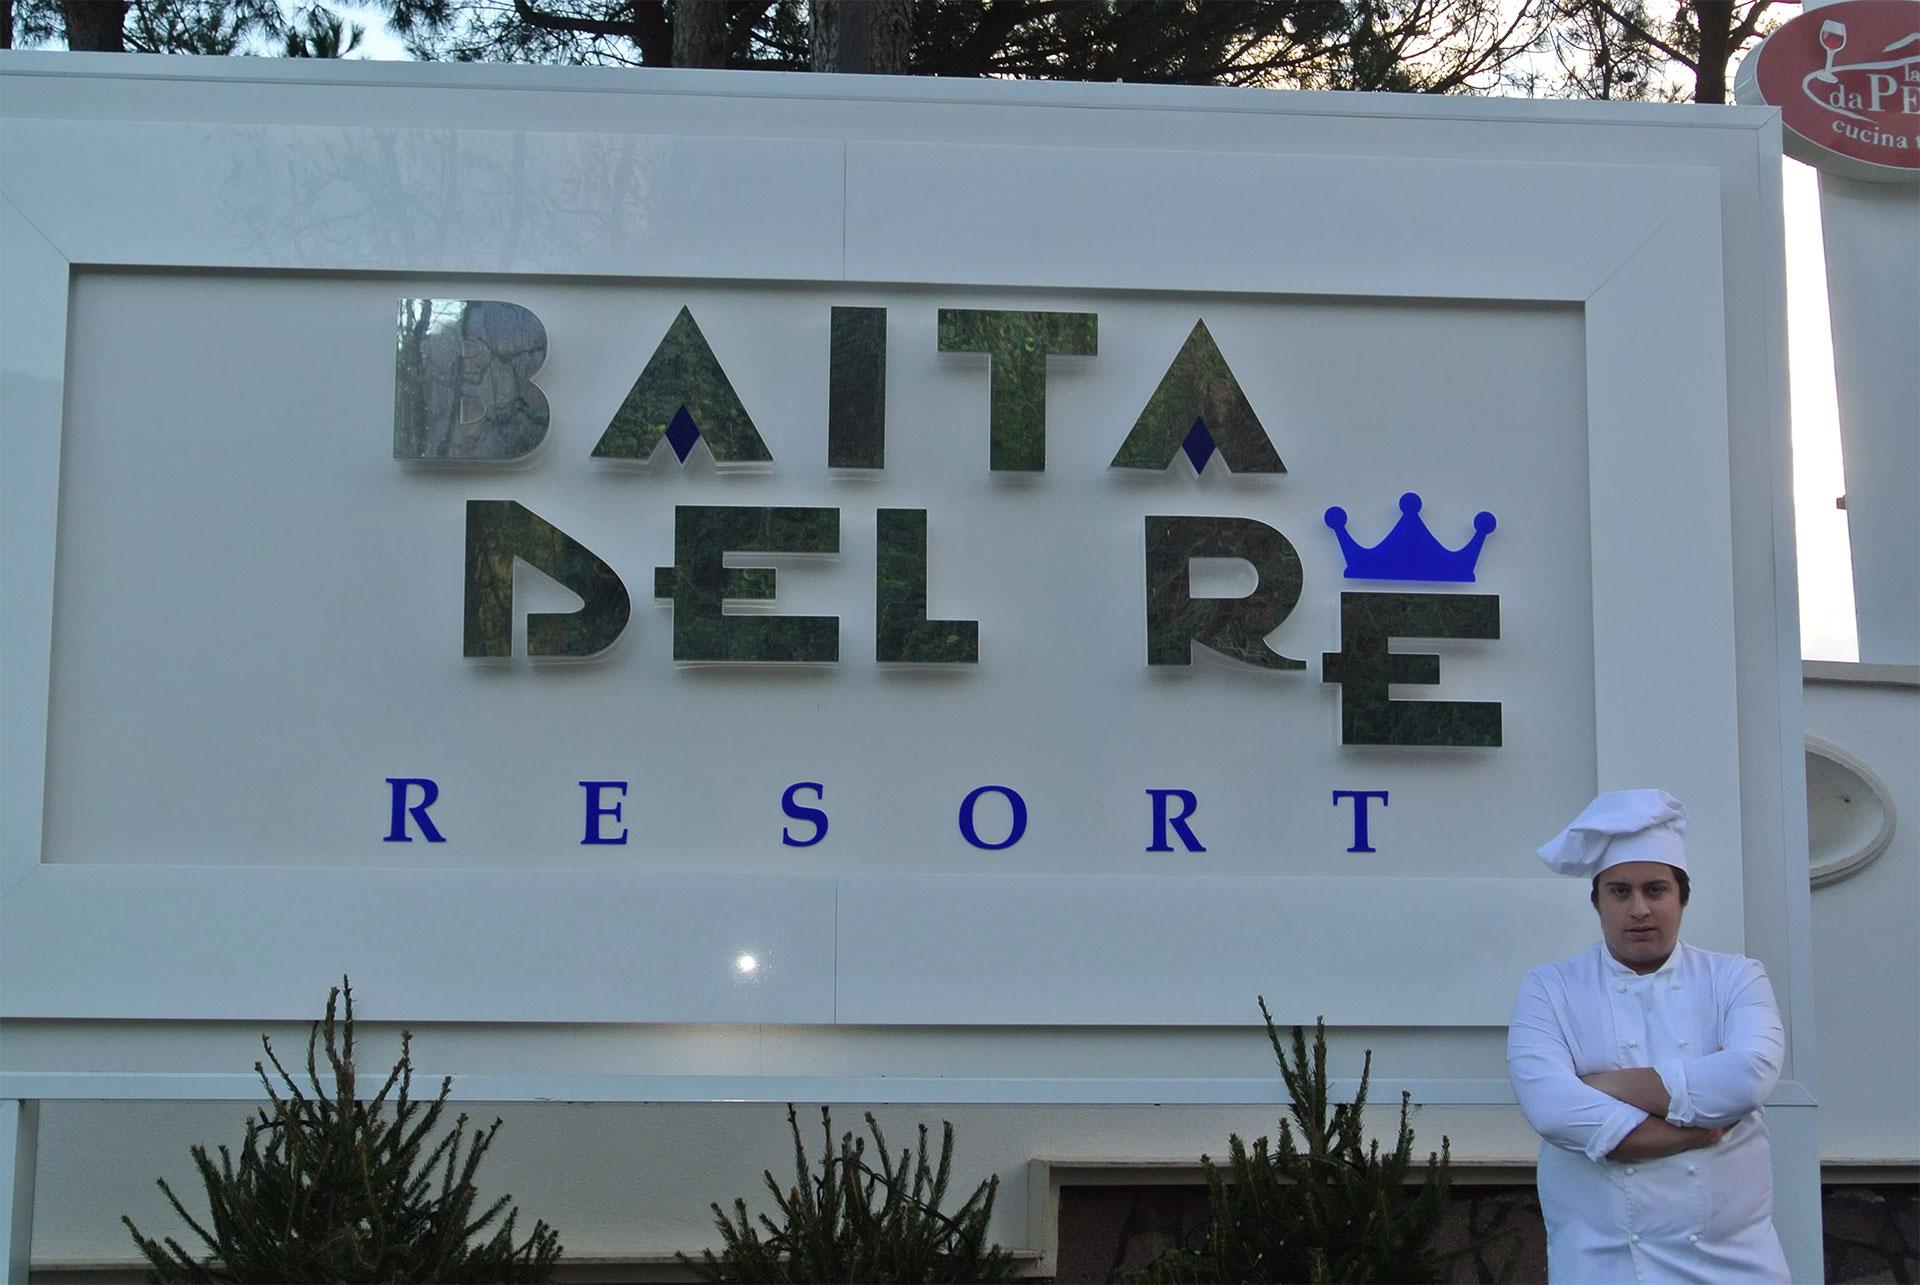 Baita del Re resort | Vesuvio Ultra Marathon